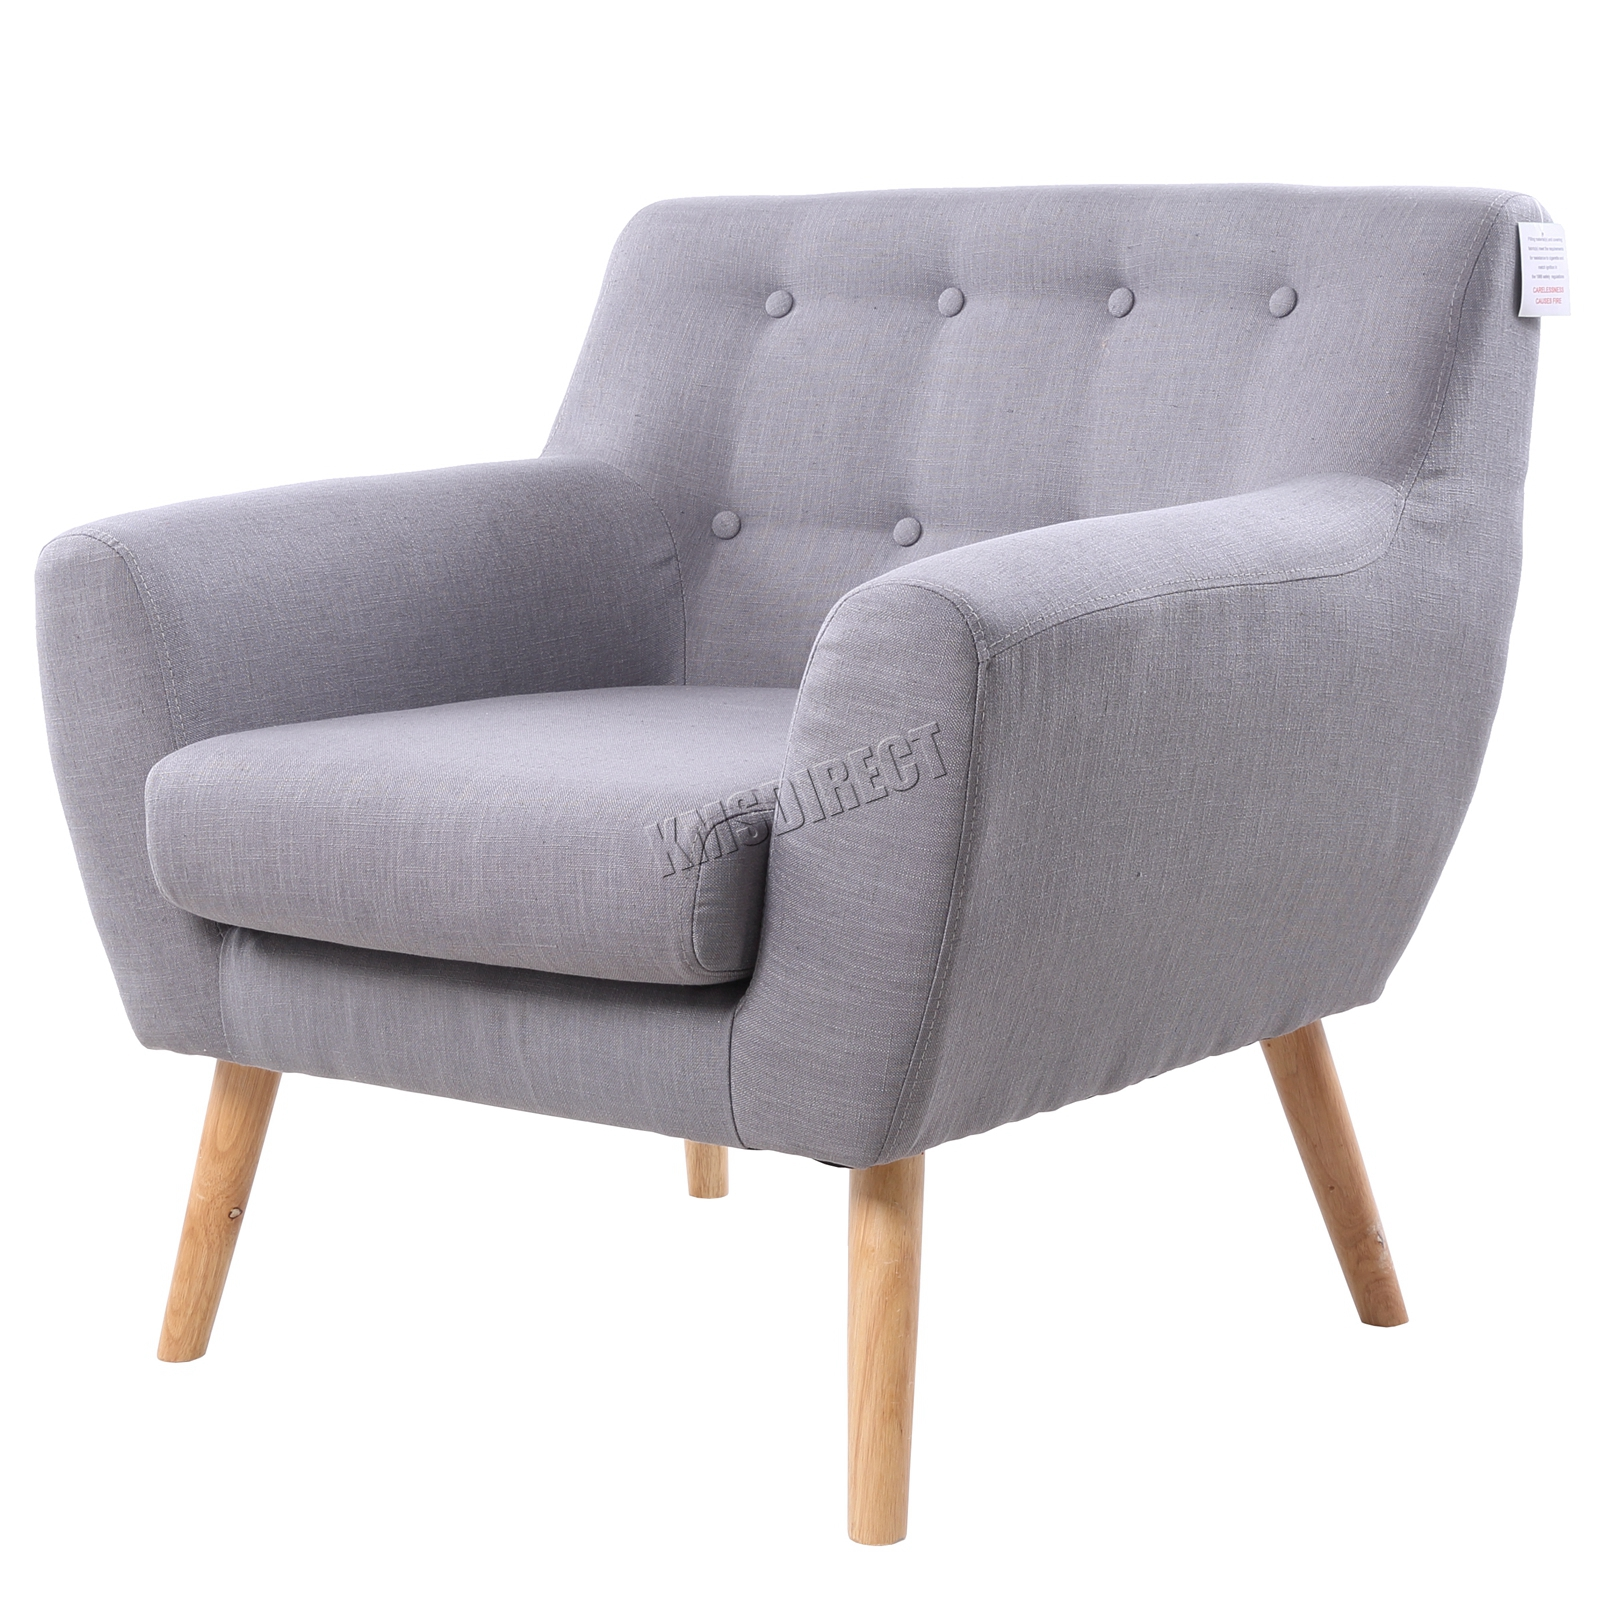 chair stool sofa ergonomic under 200 foxhunter linen fabric 1 single seat tub arm